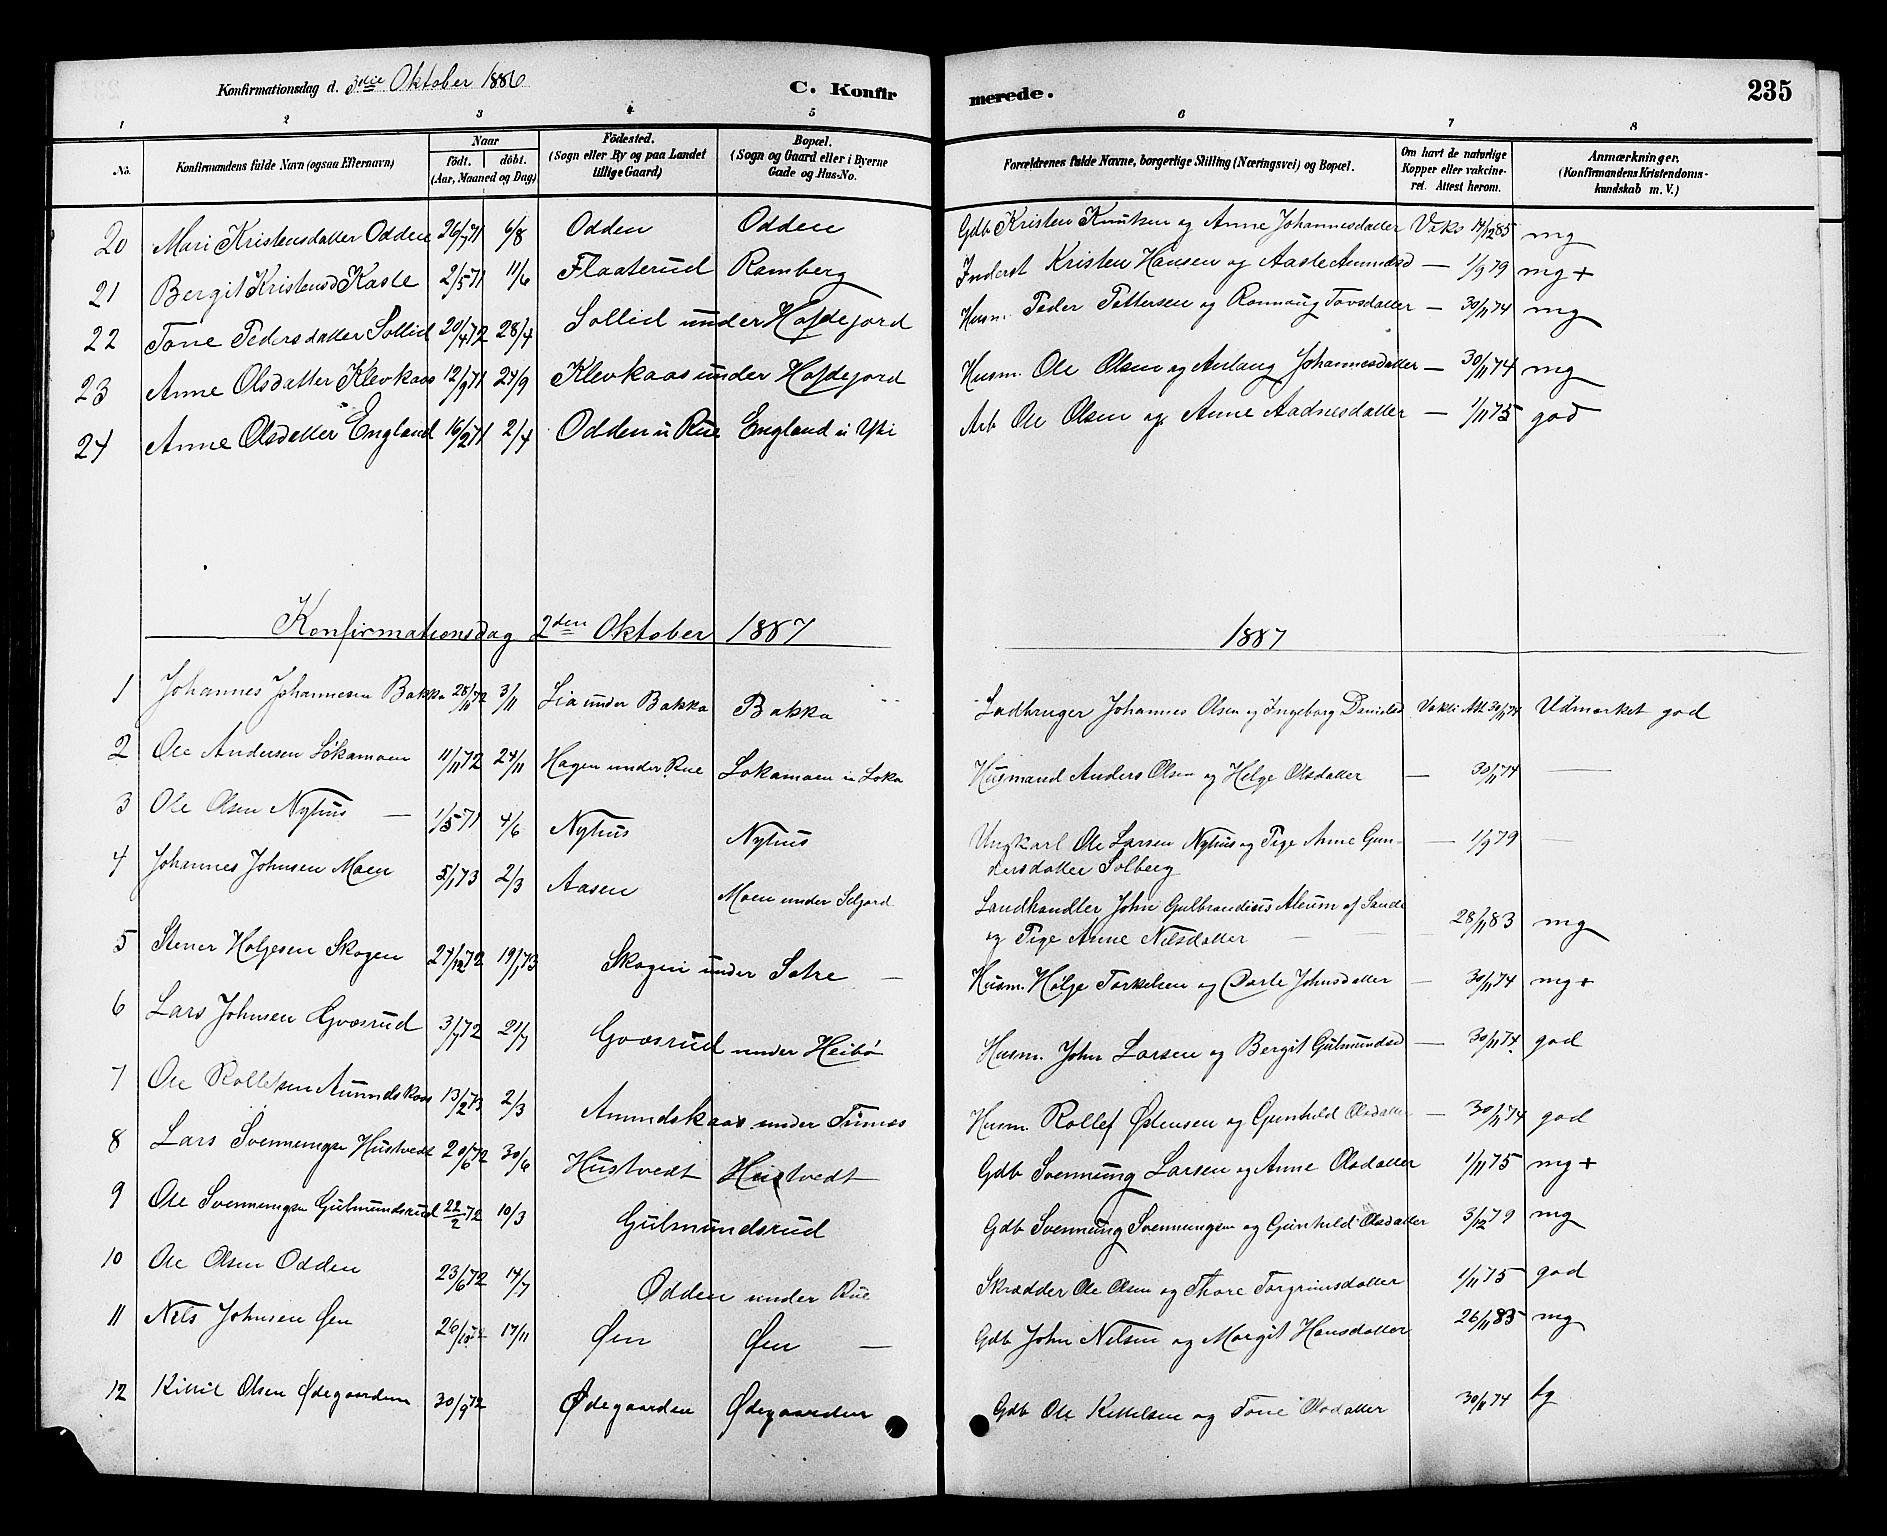 SAKO, Heddal kirkebøker, G/Ga/L0002: Klokkerbok nr. I 2, 1879-1908, s. 235